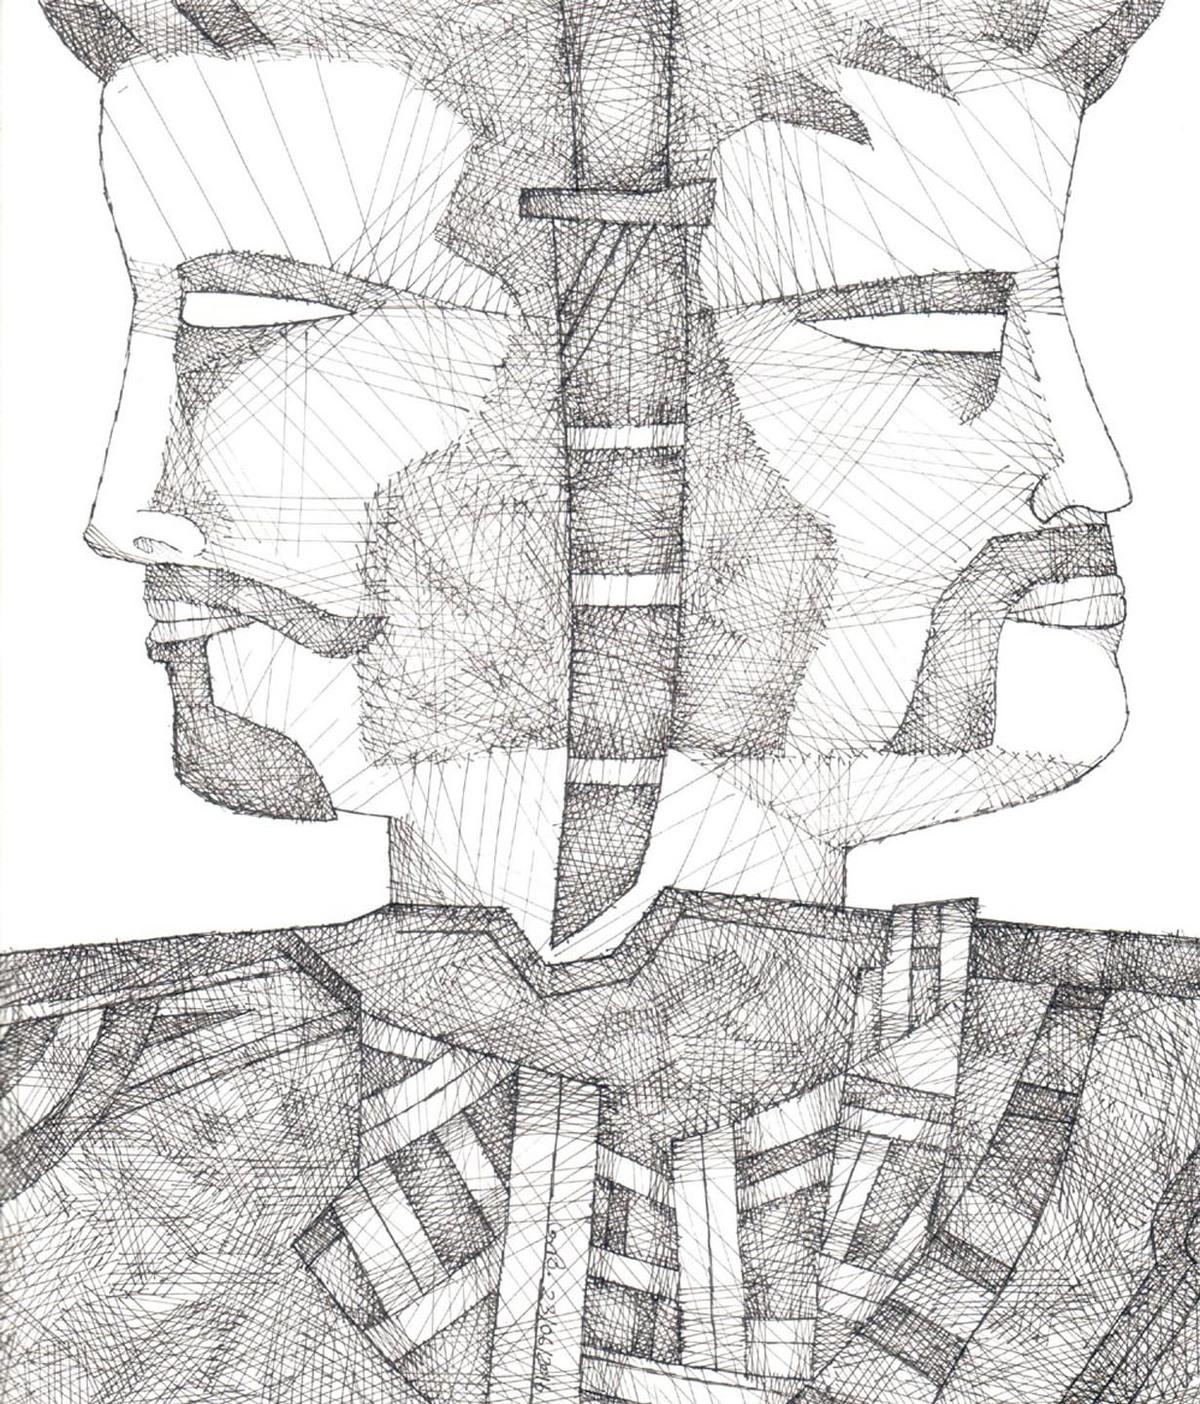 Karna-Arjun by Amit Biswas, Illustration Drawing, Pen & Ink on Paper, Grey color